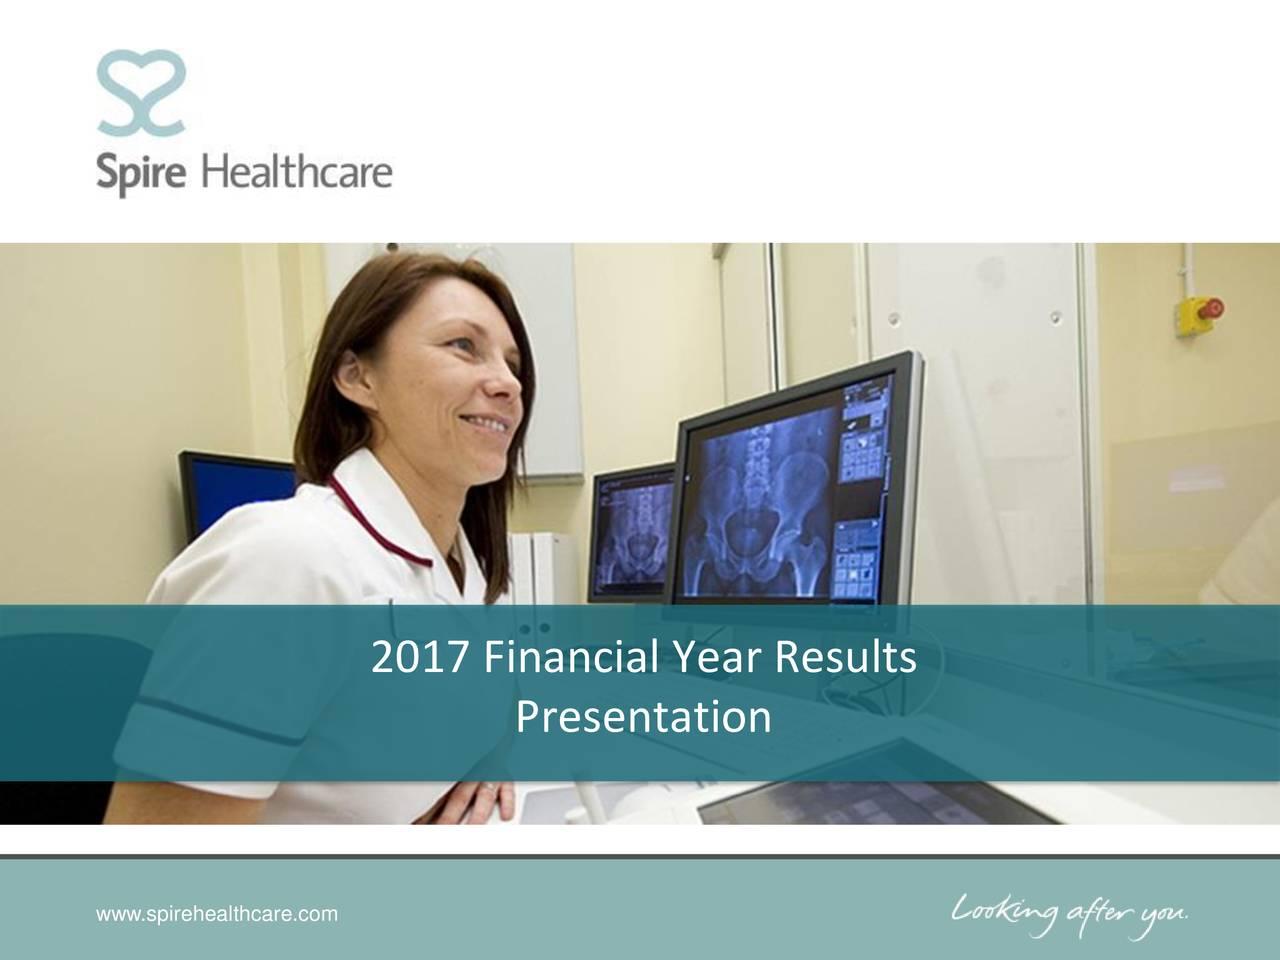 Spire healthcare group plc ipo